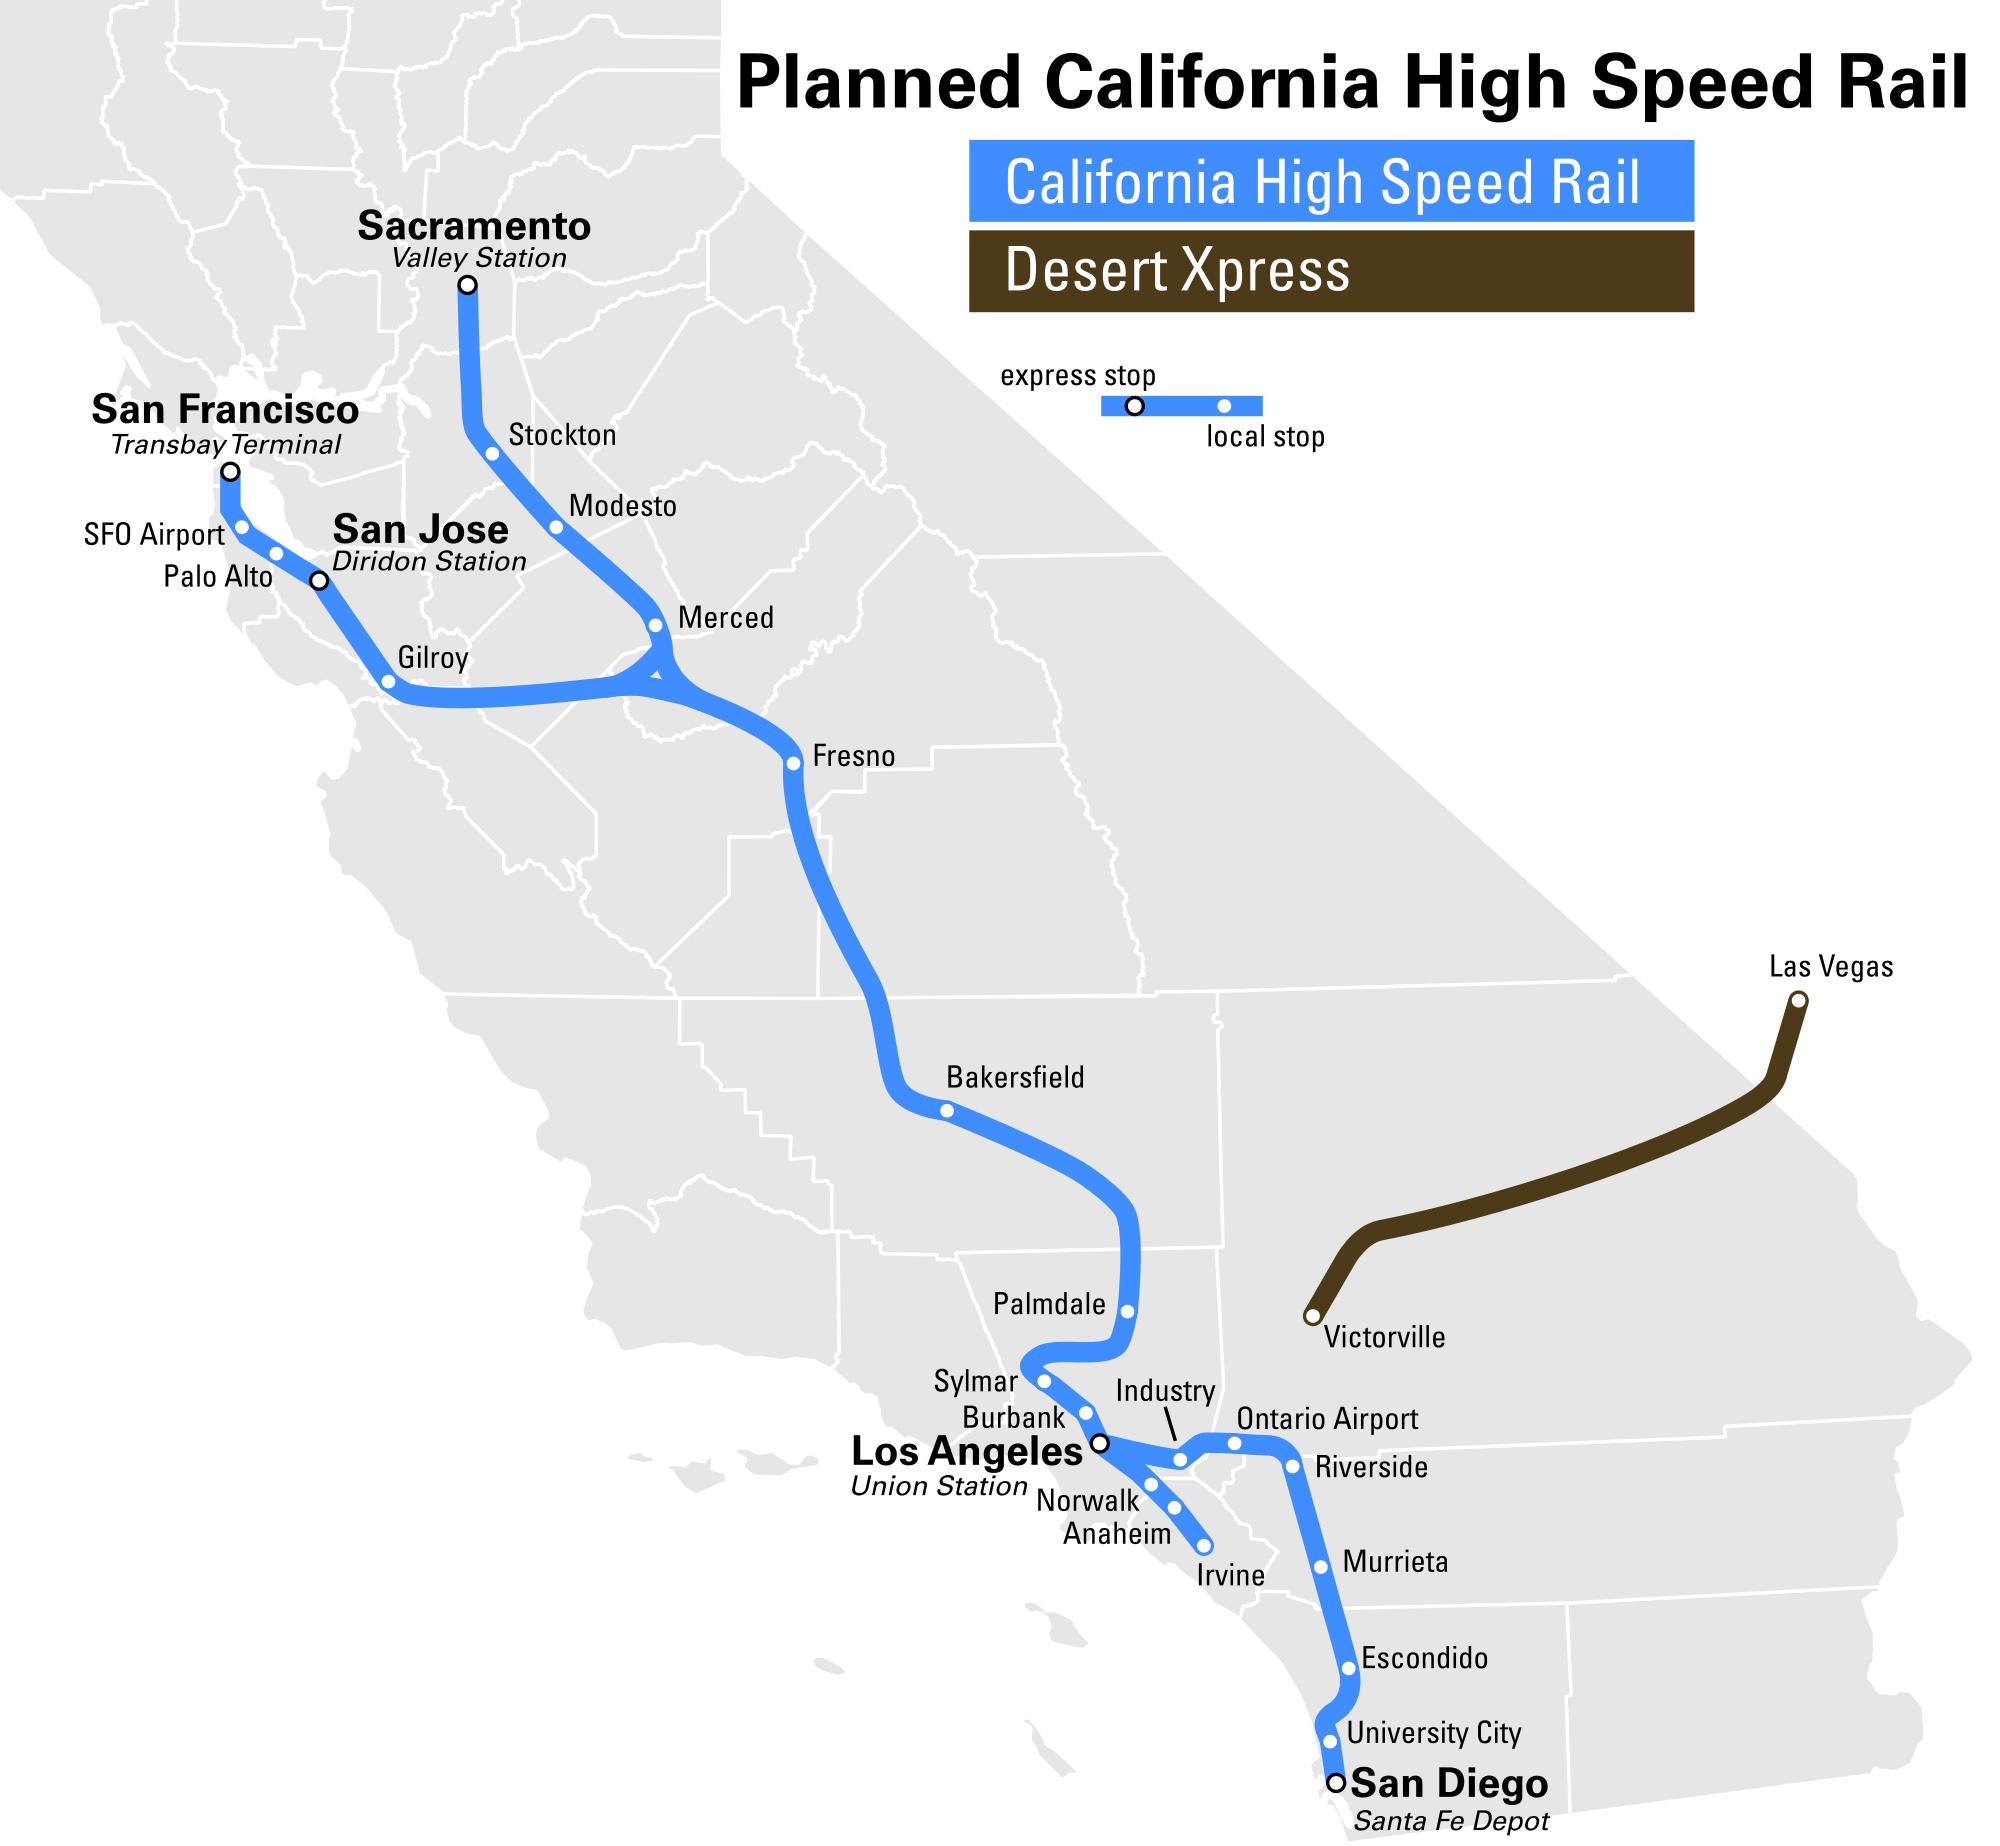 Amtrak Station Map California California River Map Amtrak Stations - Amtrak California Map Stations